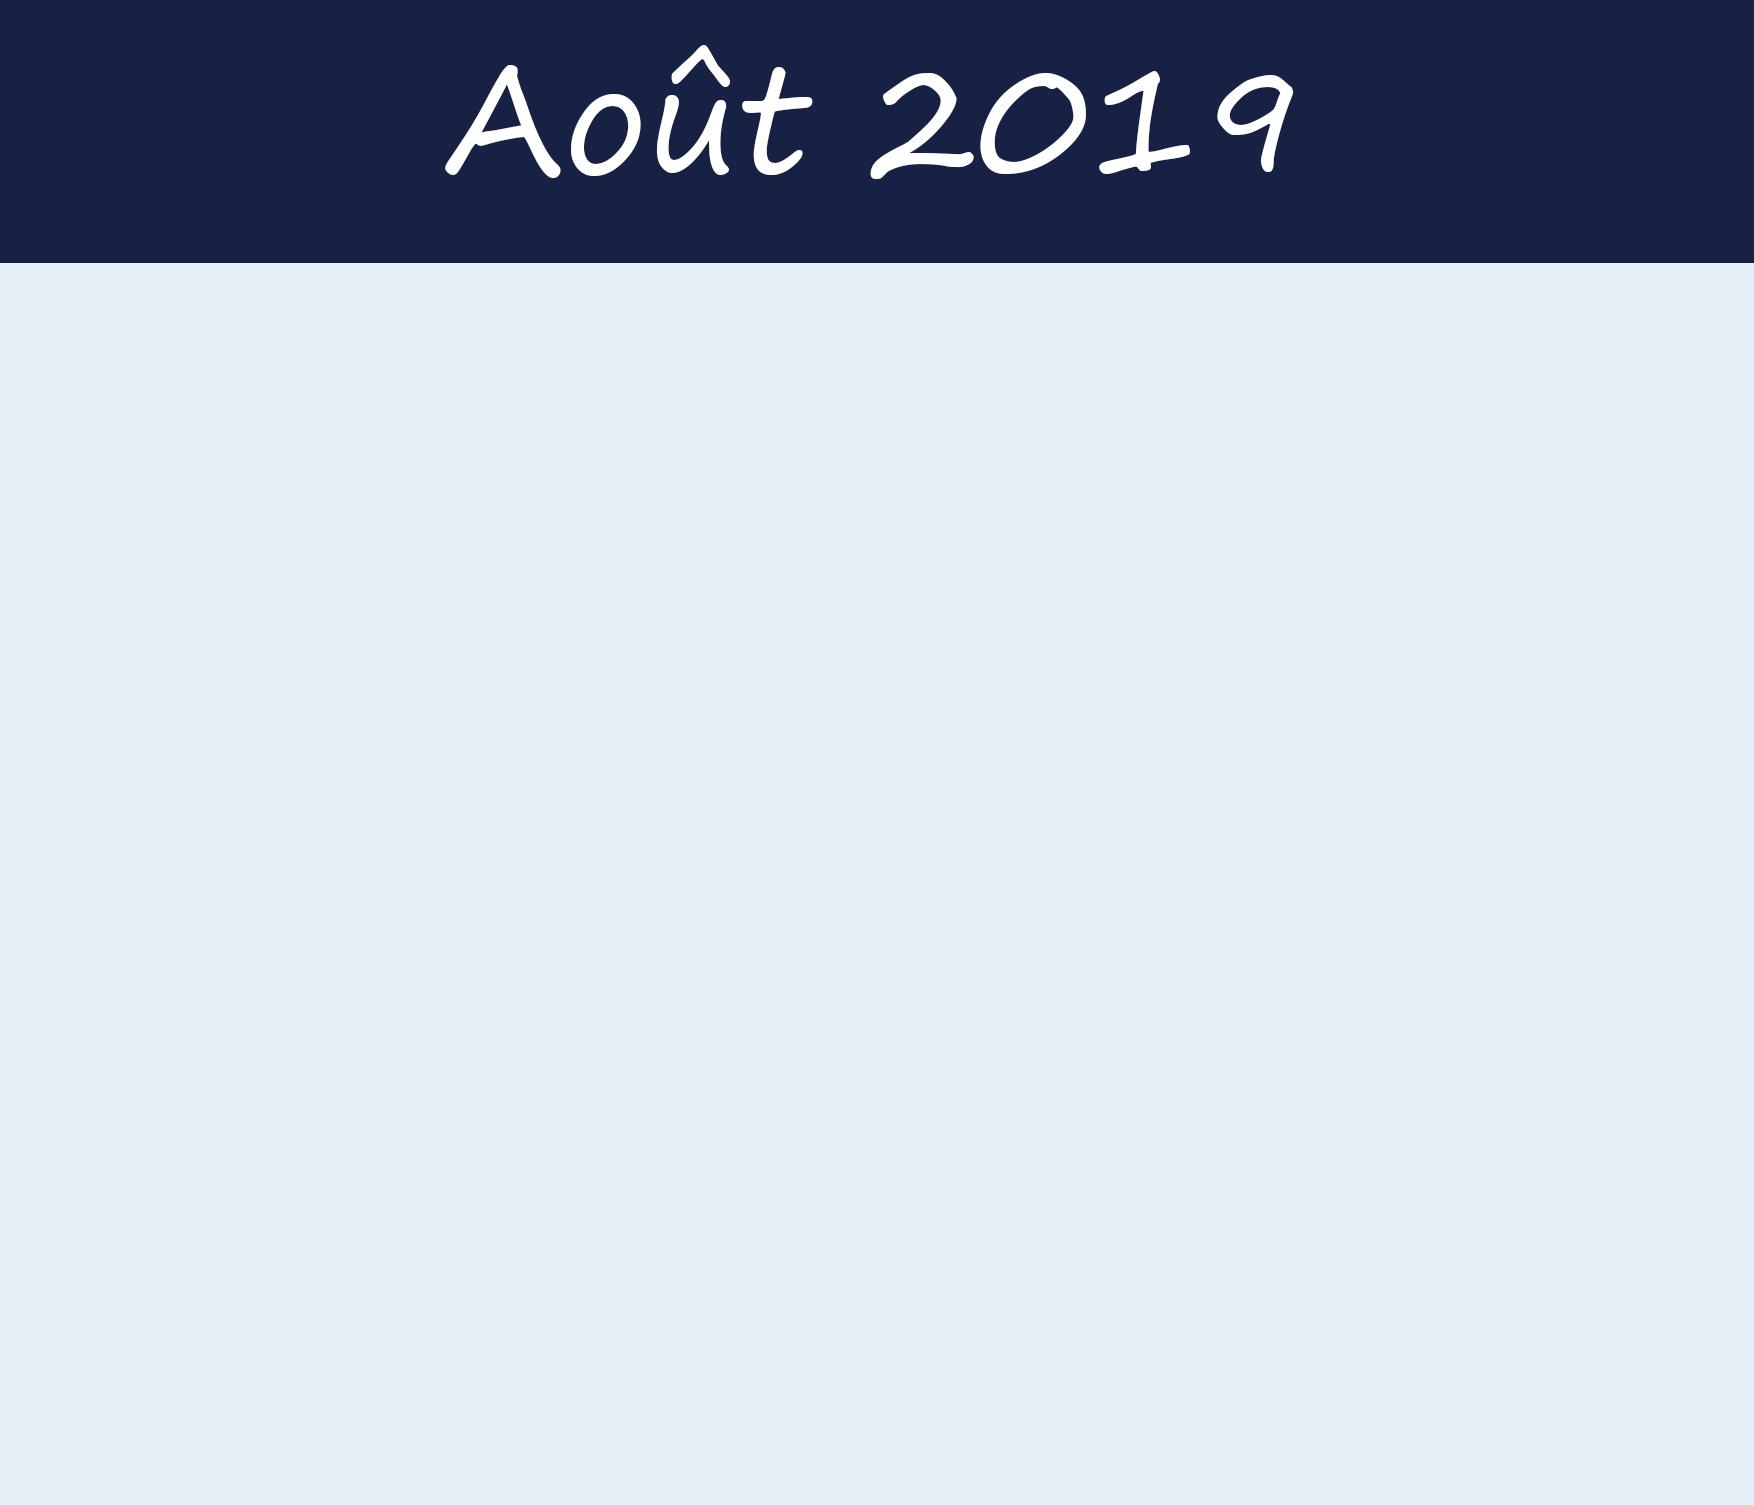 Aout_2019.jpg